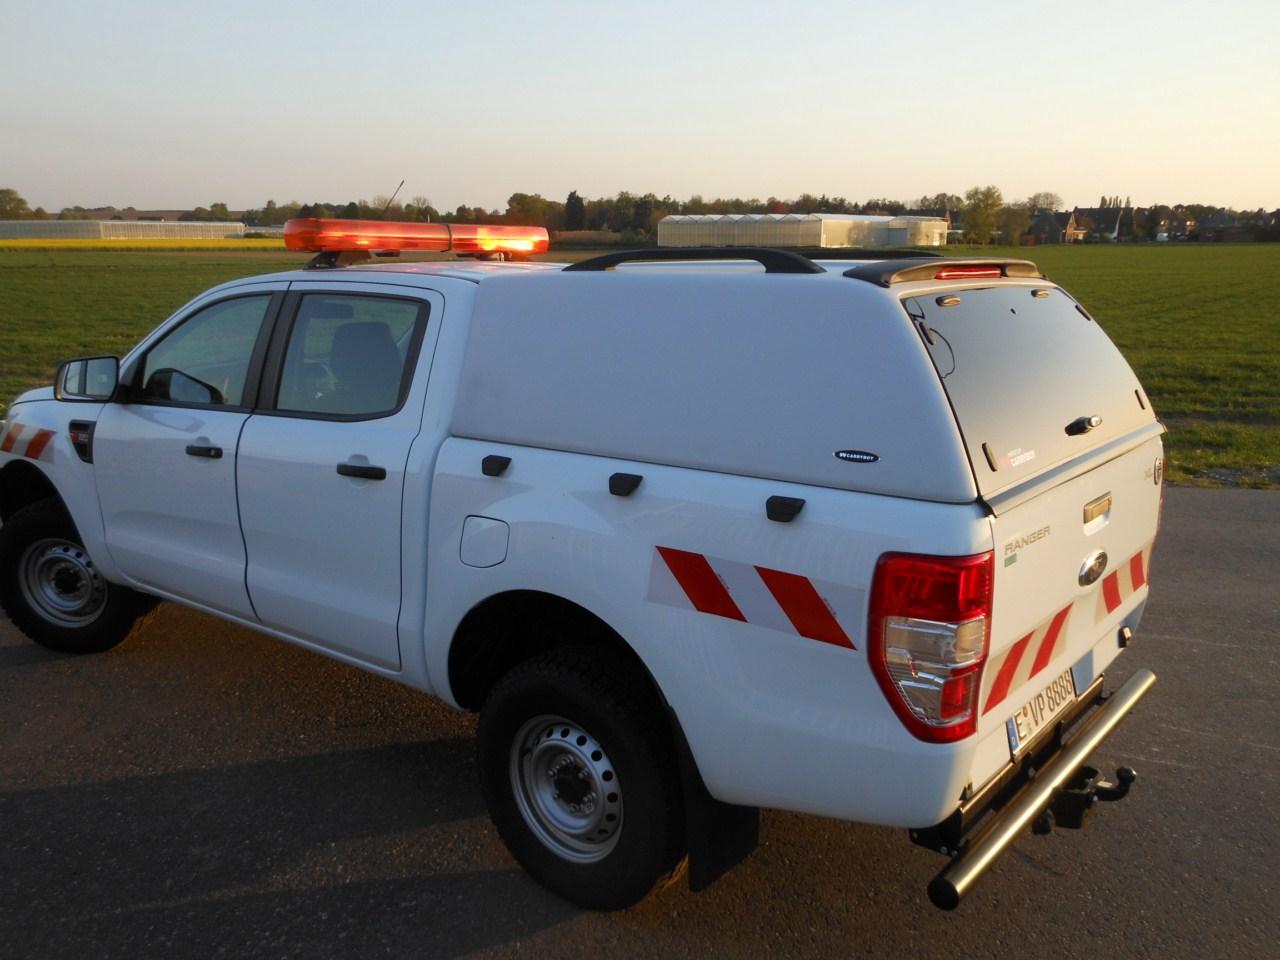 CARRYBOY Hardtop 560os_TVD ohne Seitenfenster Toyota Hilux Vigo Doppelkabine 2005-2015 extrem belastbares GFK